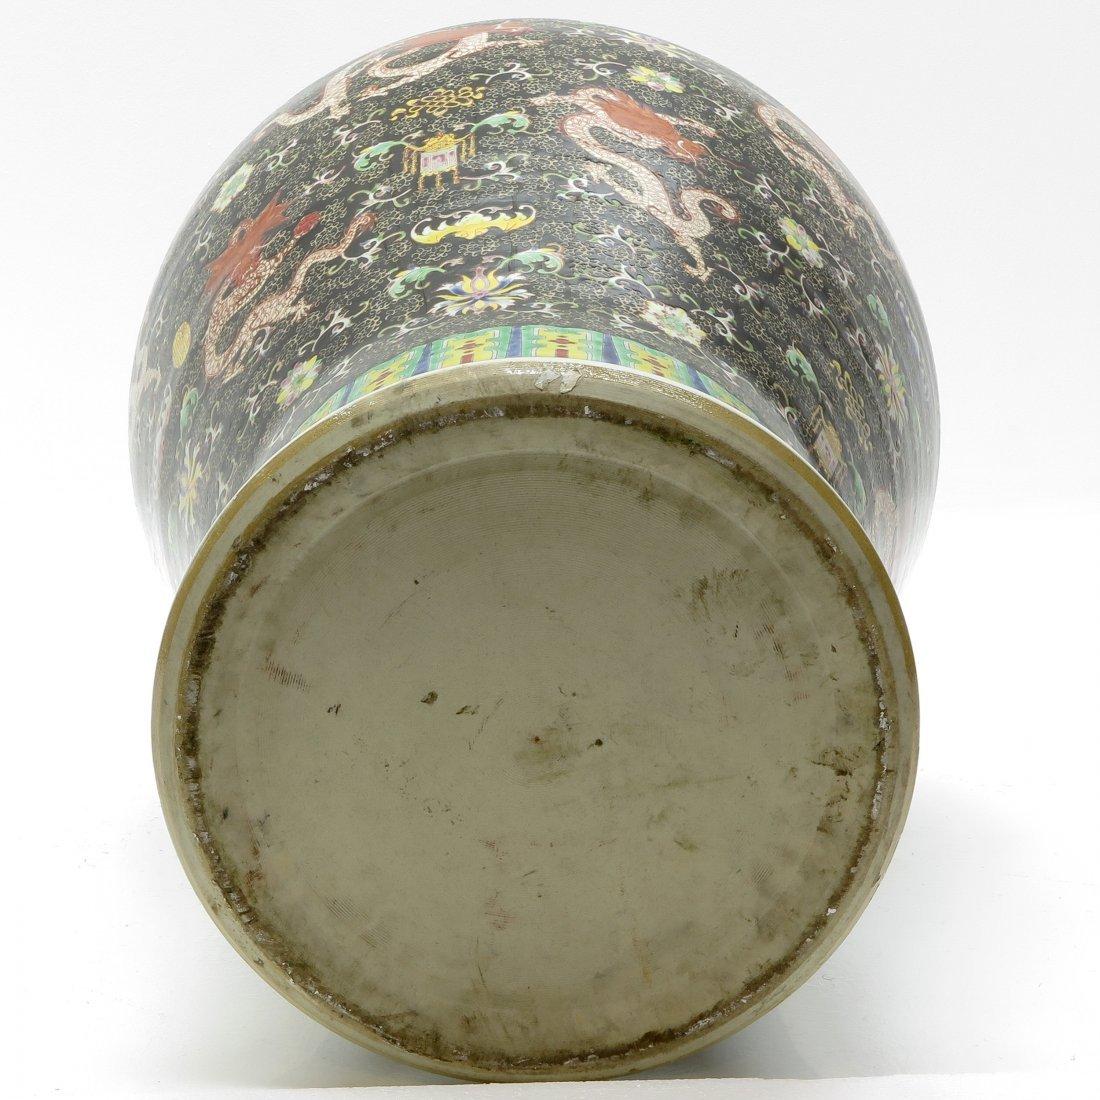 China Porcelain Famille Noir Lidded Vase - 6